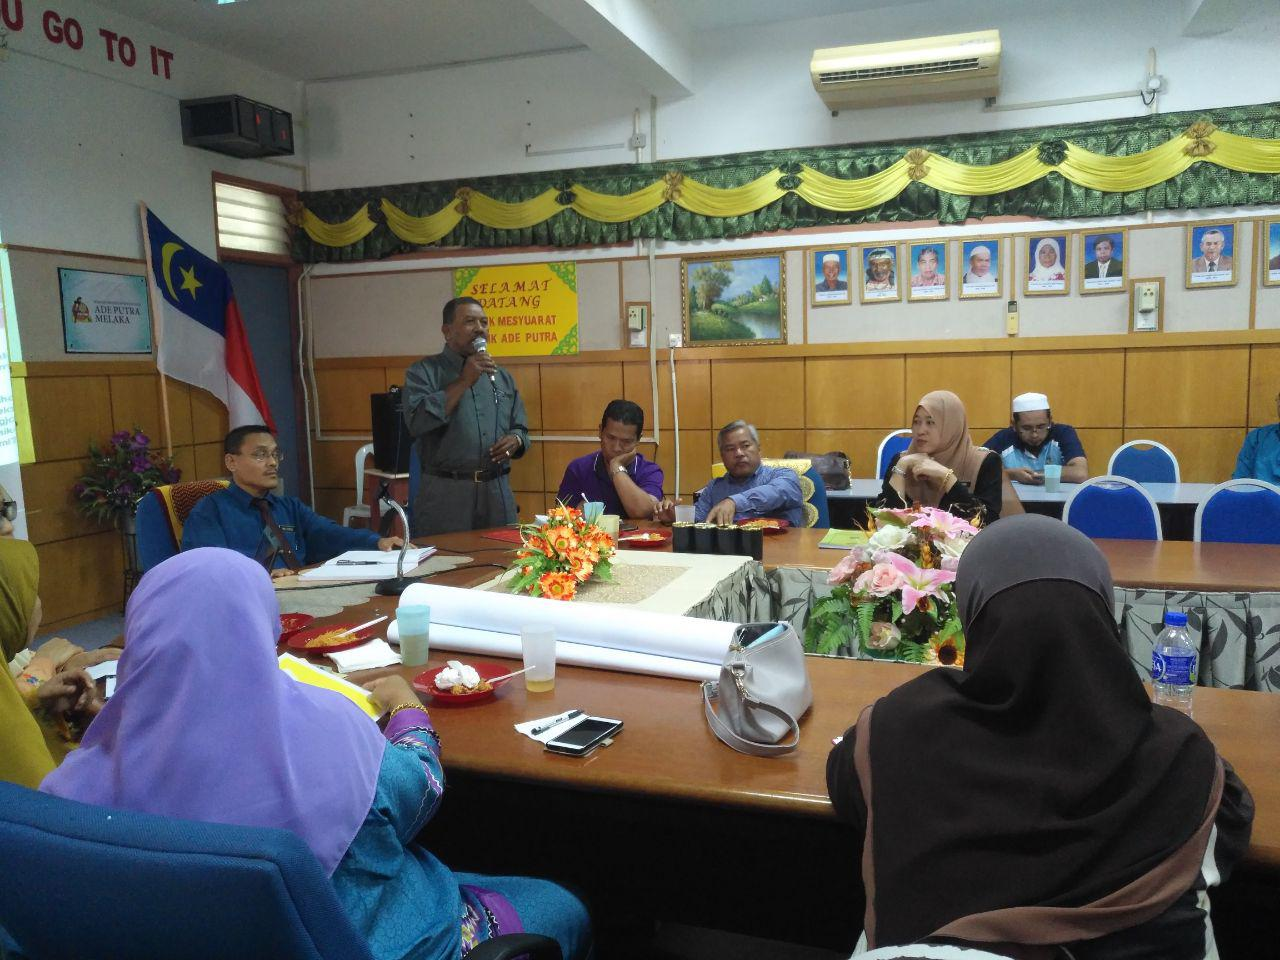 Smk Ade Putra Ladap 3 Kepentingan Pak 21 Dan Kbat Dalam Pdpc